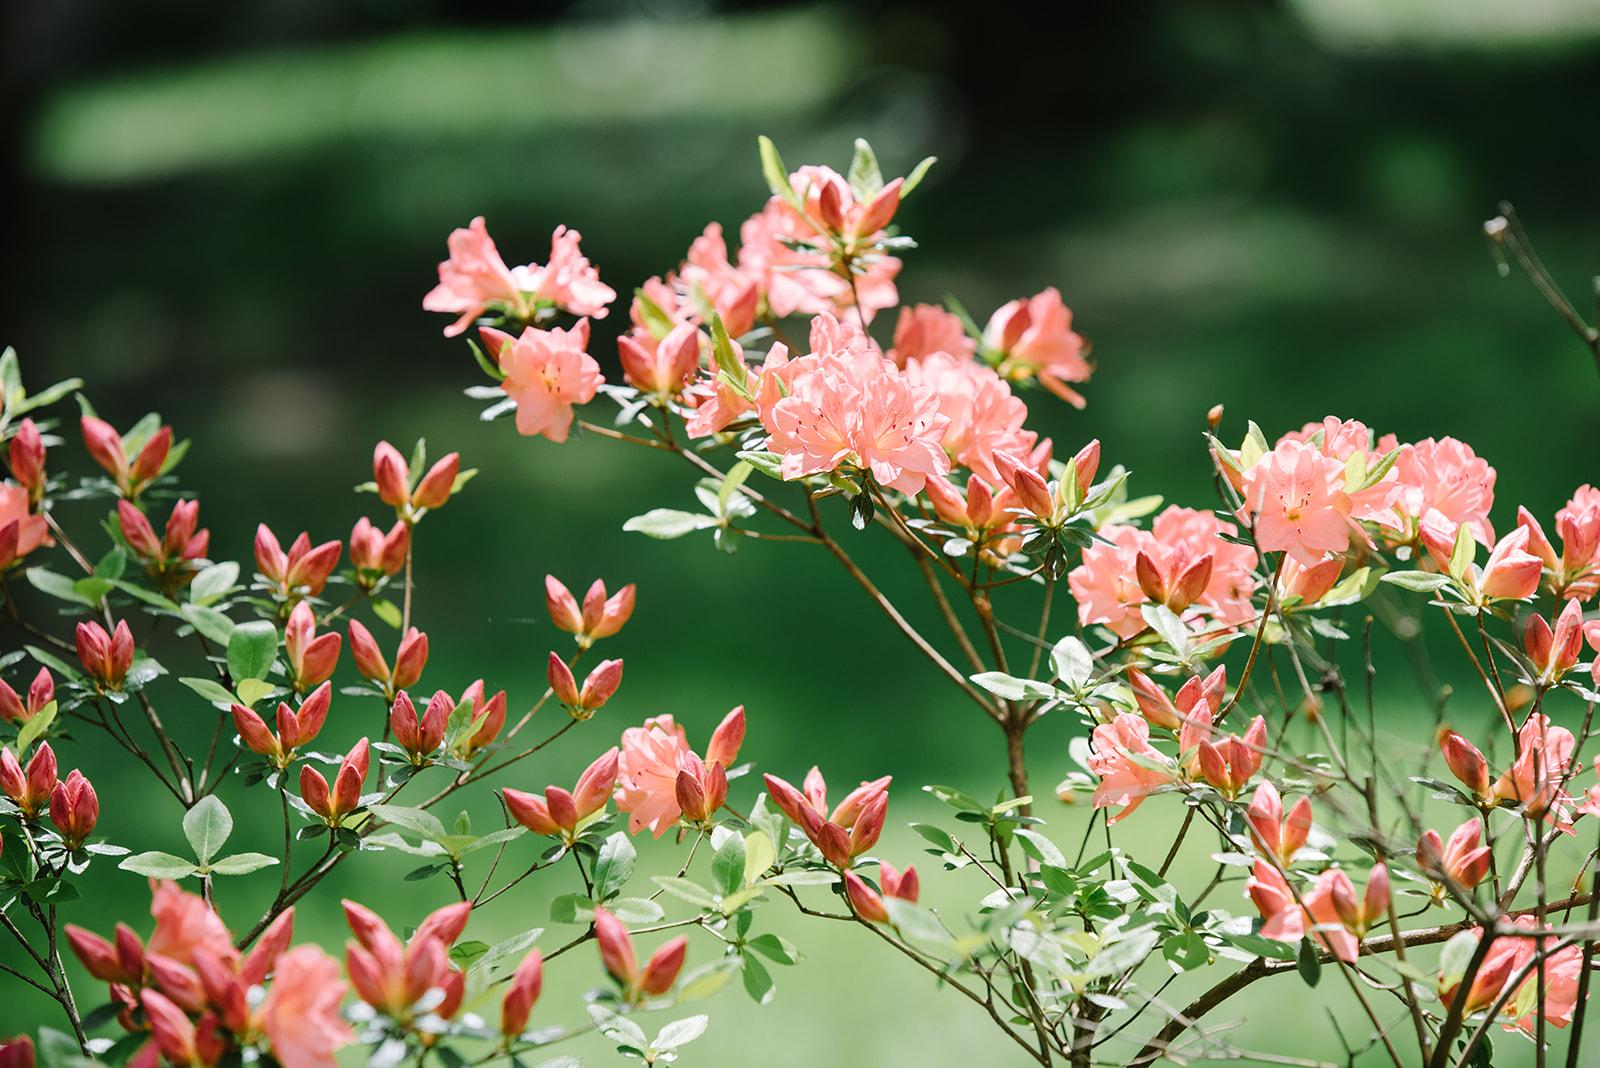 Surprise_Proposal-_NJ_Botanical_Gardens-_Greg_and_Jackie-New_Jersey-_Olivia_Christina_Photo-3.jpg